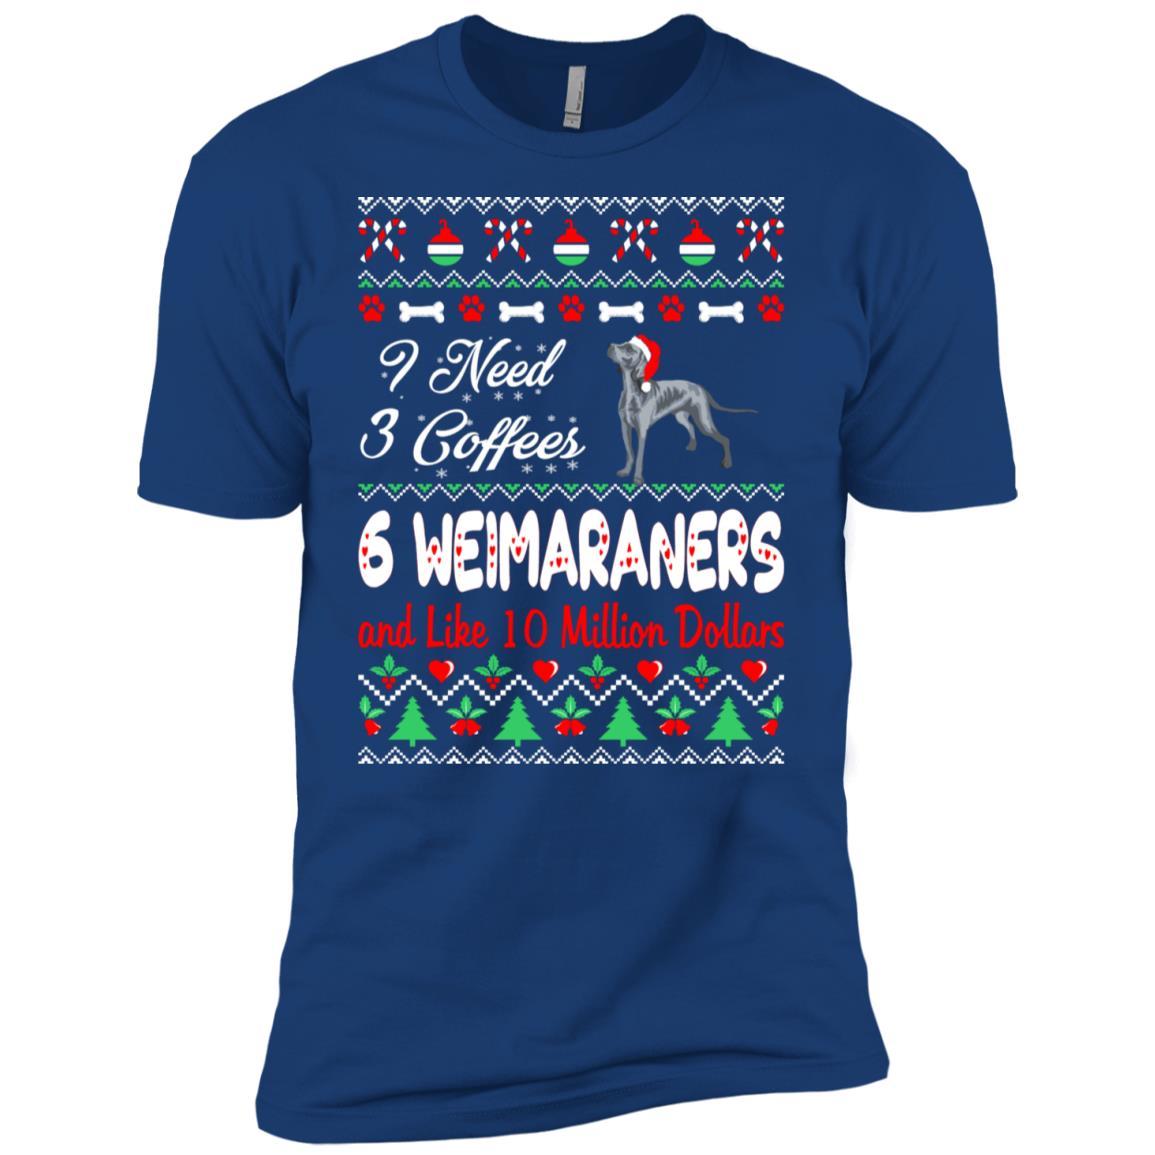 Need 3 Coffees 6 Weimaraners Christmas Ugly Sweater Men Short Sleeve T-Shirt